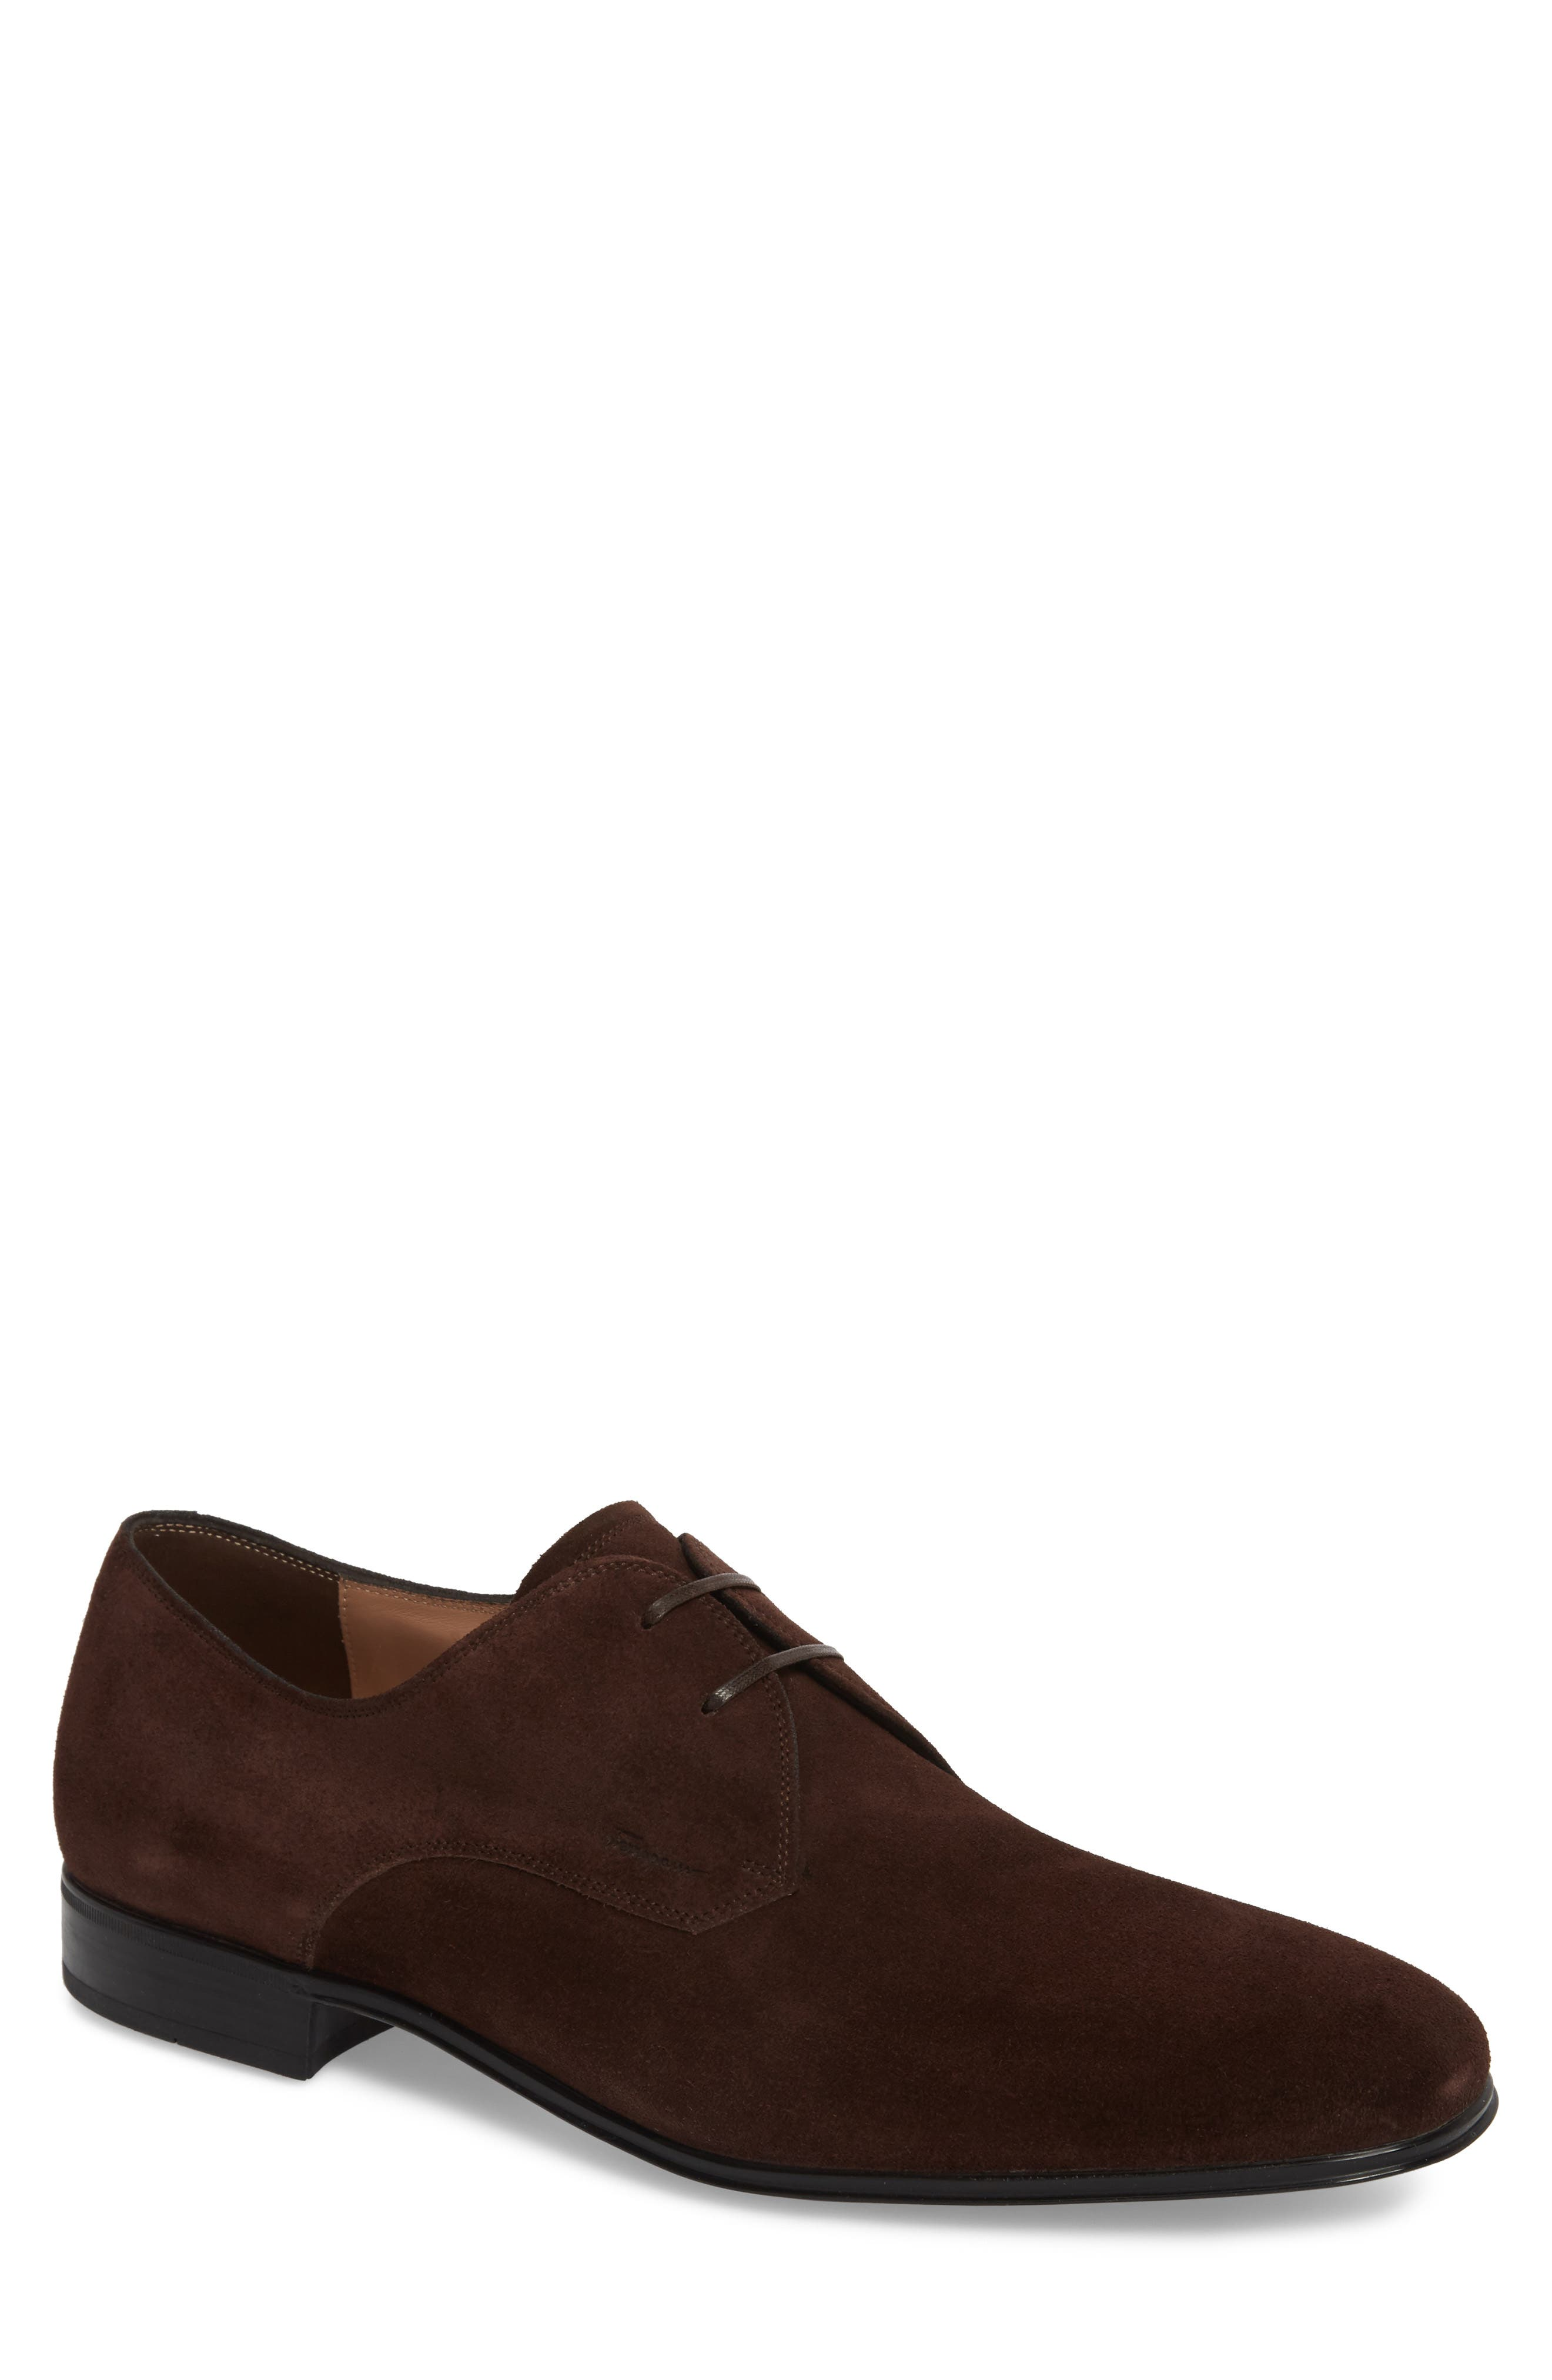 Fortunato 2 Plain Toe Derby,                         Main,                         color, Brown Suede